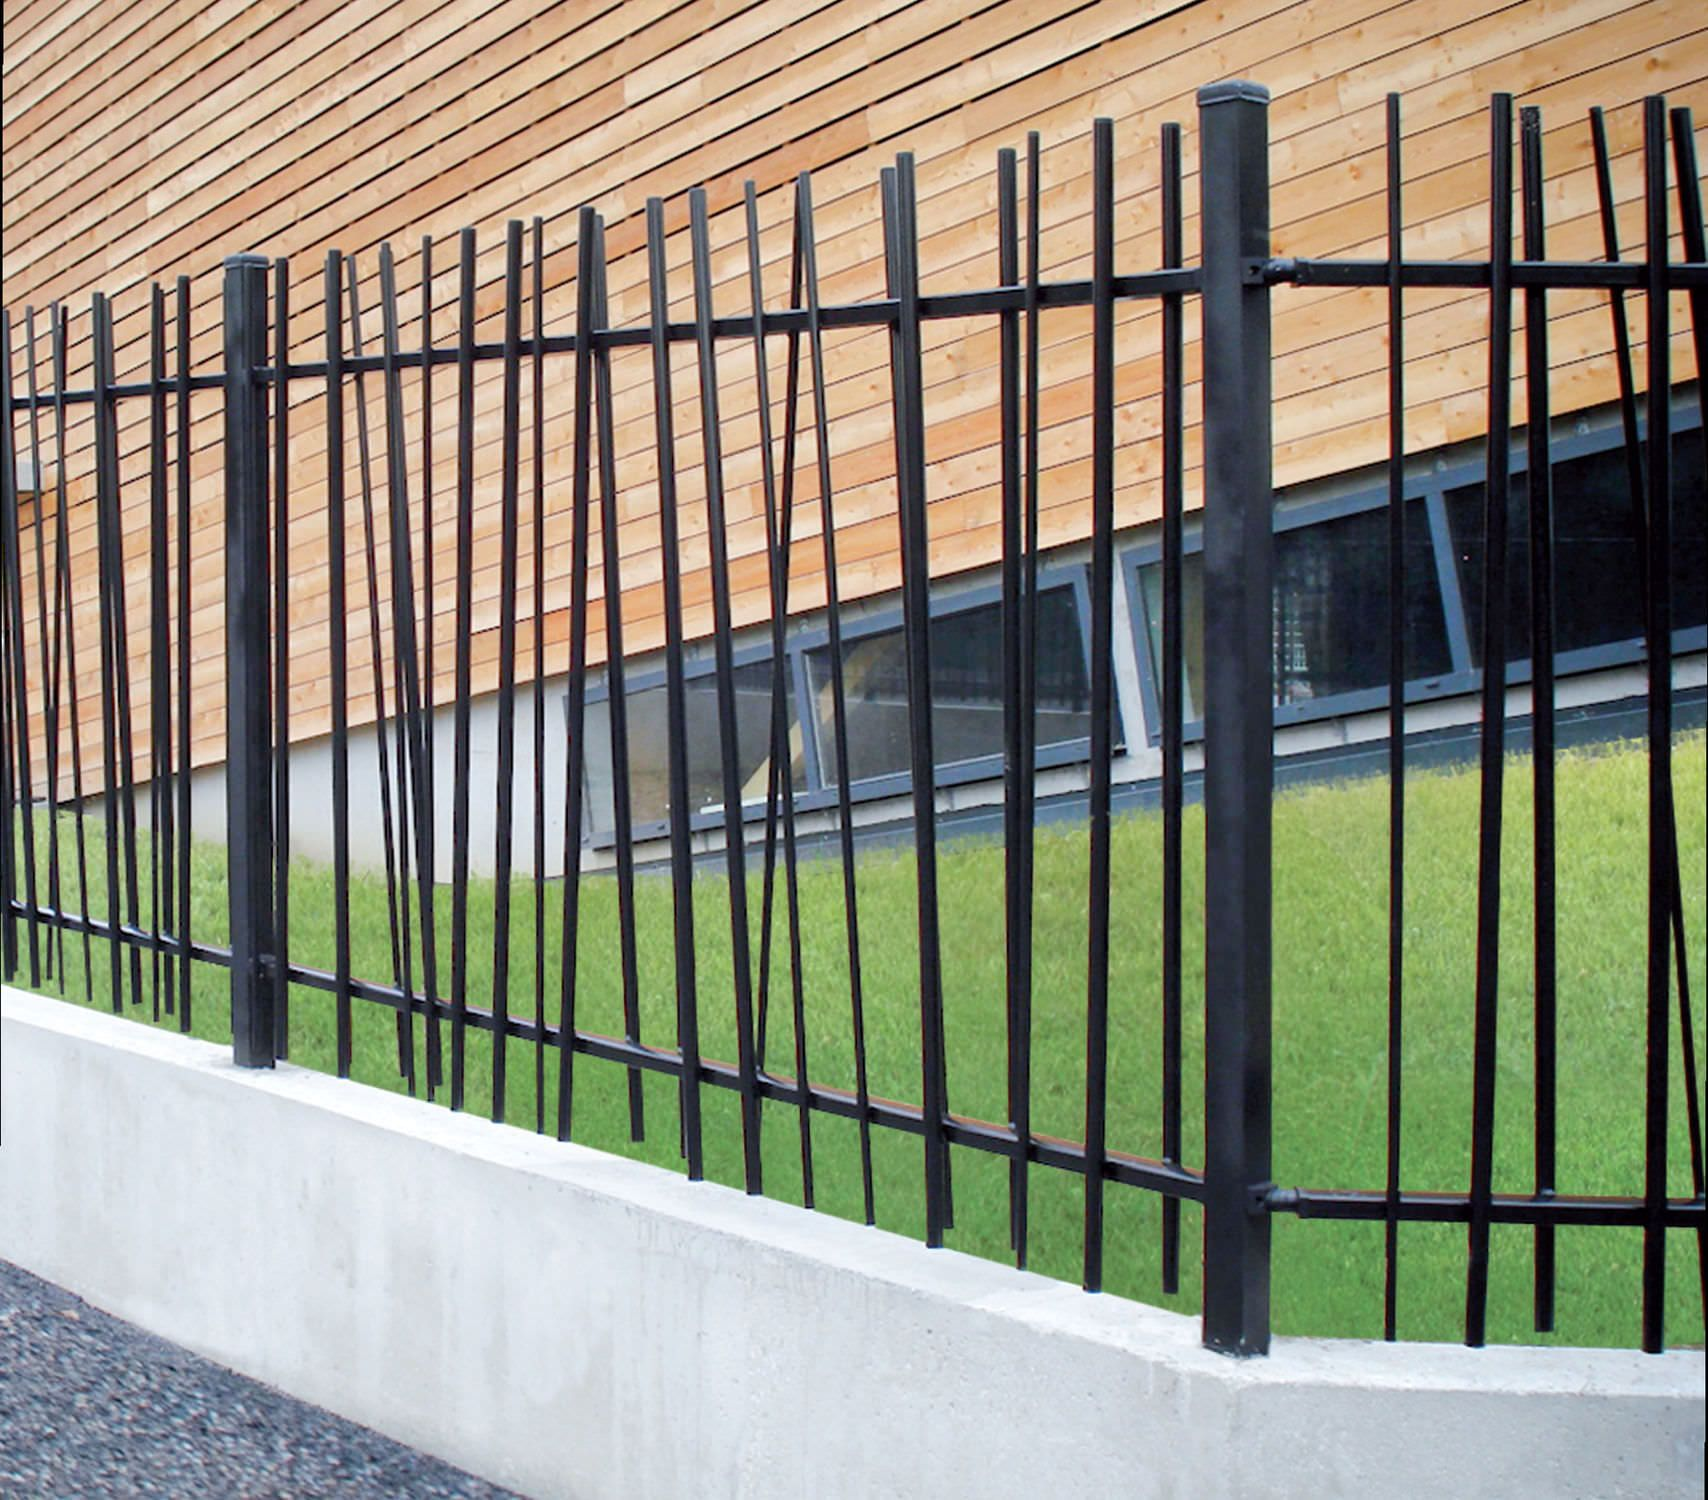 Wrought Iron Fence Panels Modern Jpg 1 708 1 500 Pixels Buiten